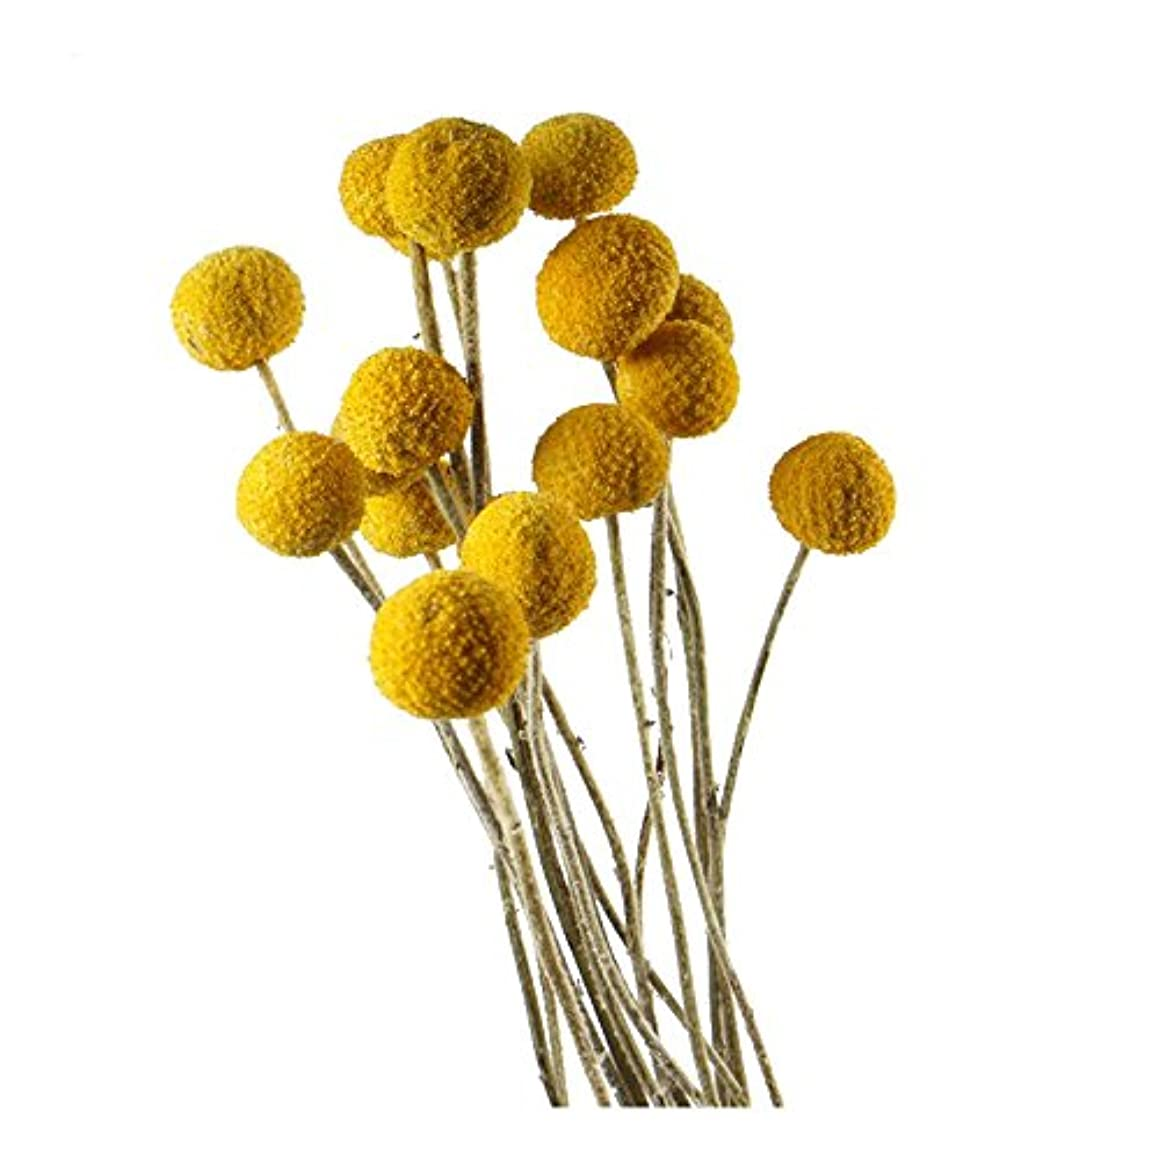 50 Stems/Pcs Dried Natural Craspedia Flowers,Billy Button Balls,17'' Tall